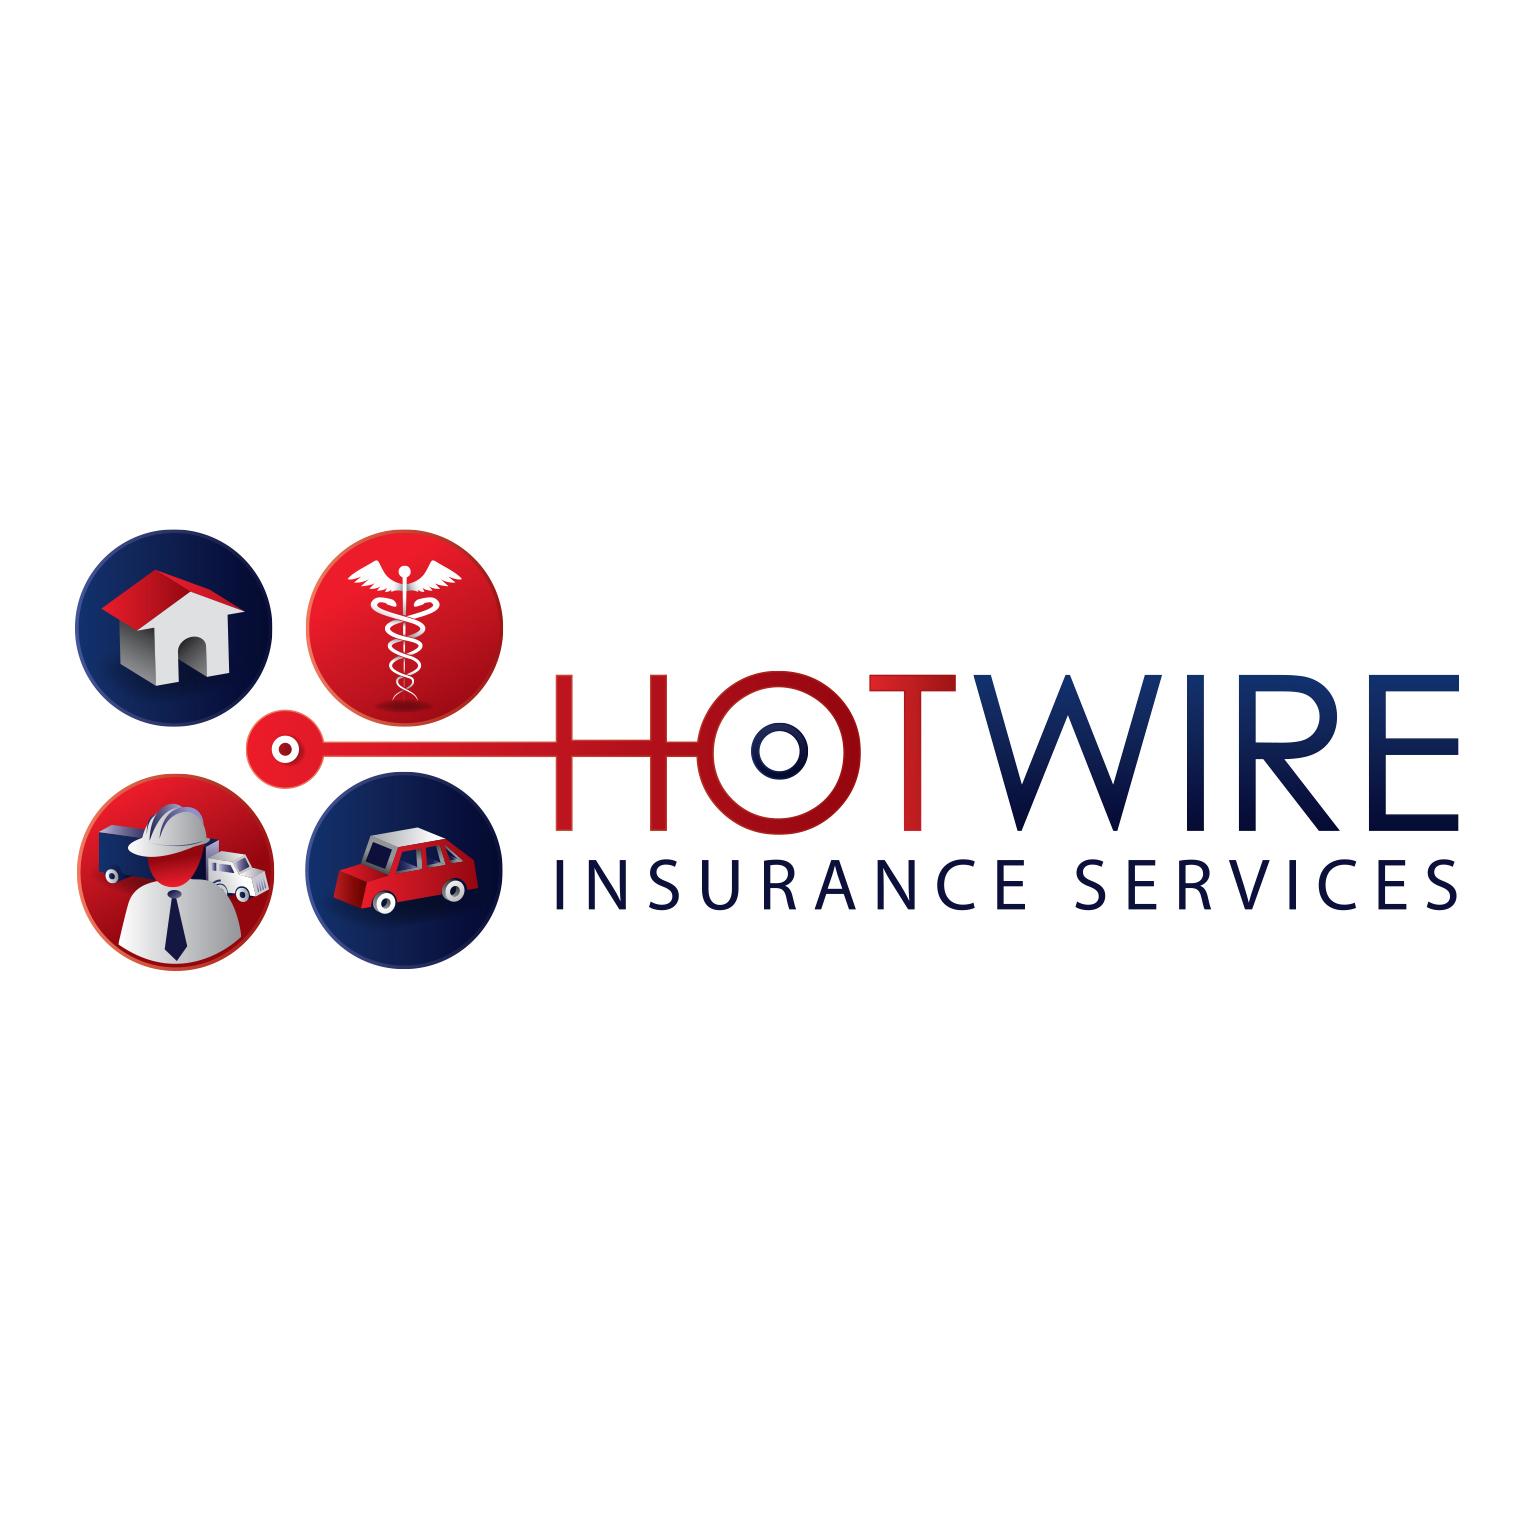 Hotwire Insurance - Insurance Agency - Chula Vista, CA 91910